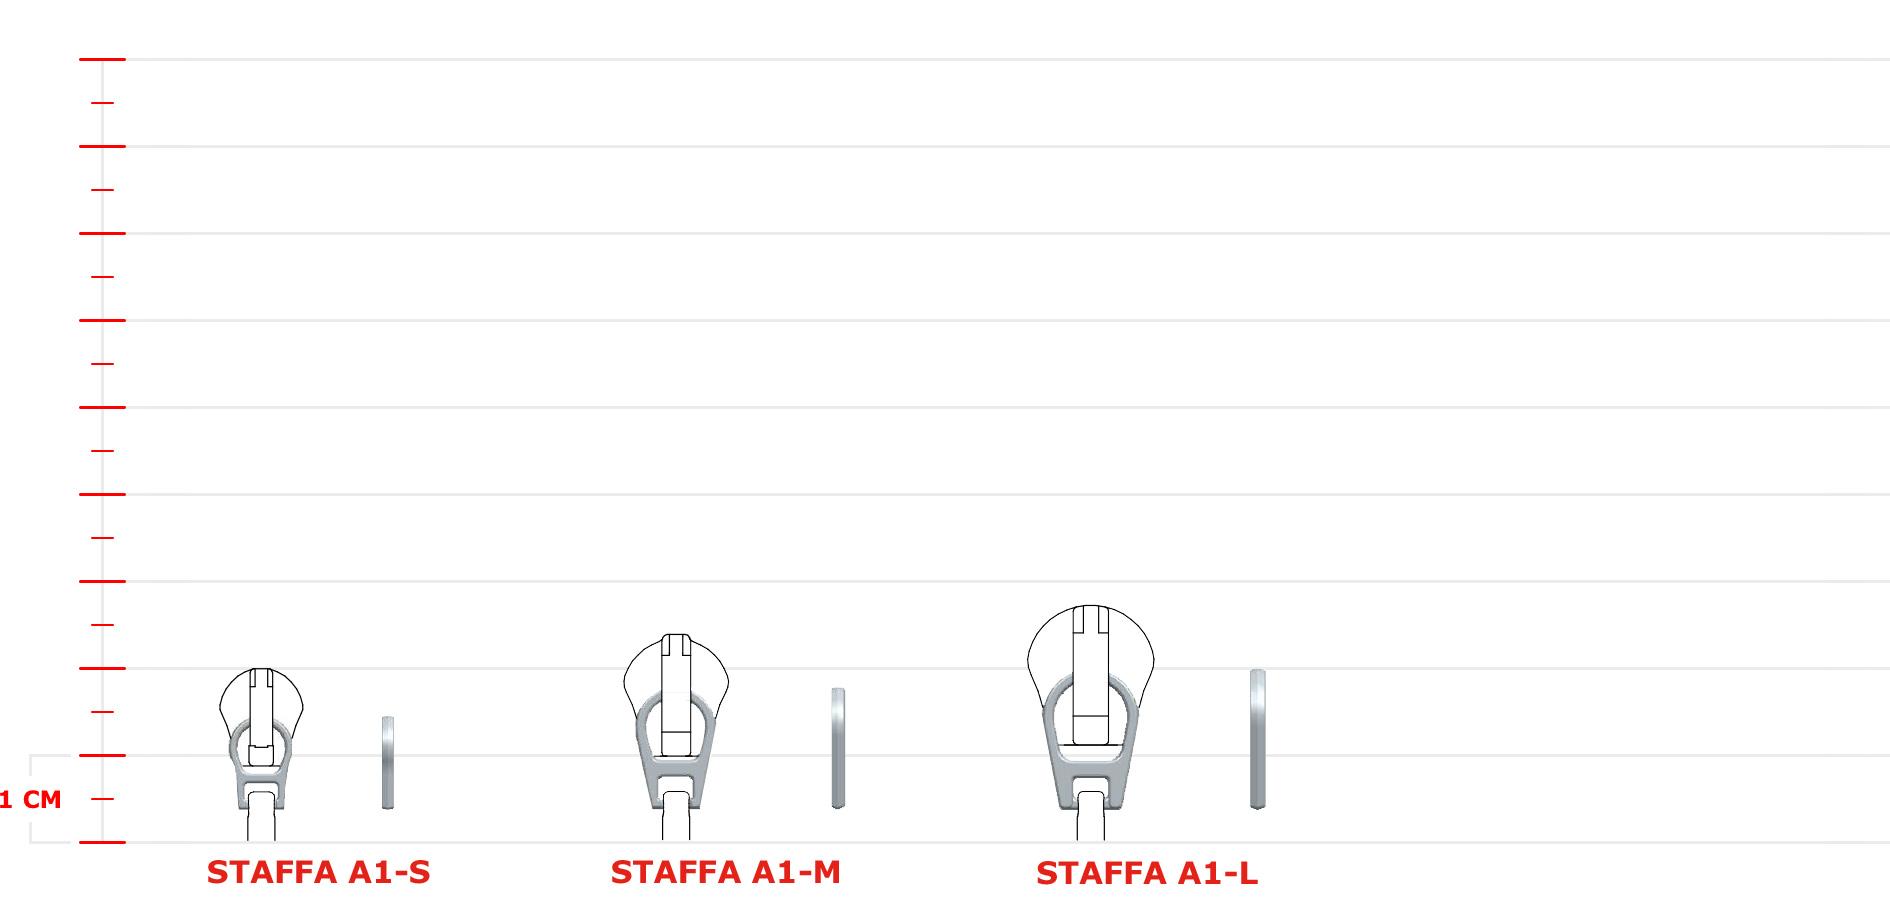 staffa-a1